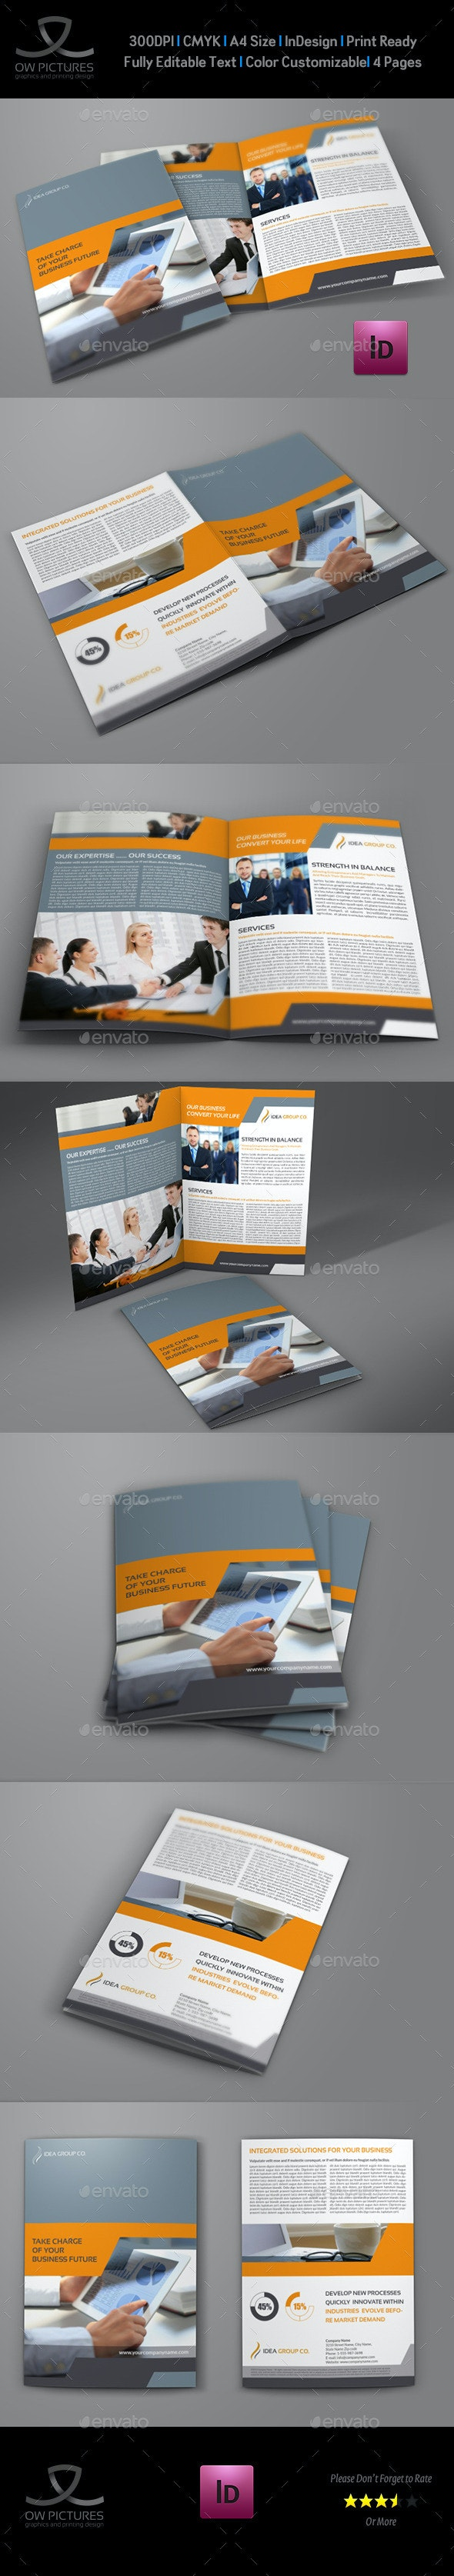 Company Brochure Bi-Fold Template Vol.34 - Corporate Brochures